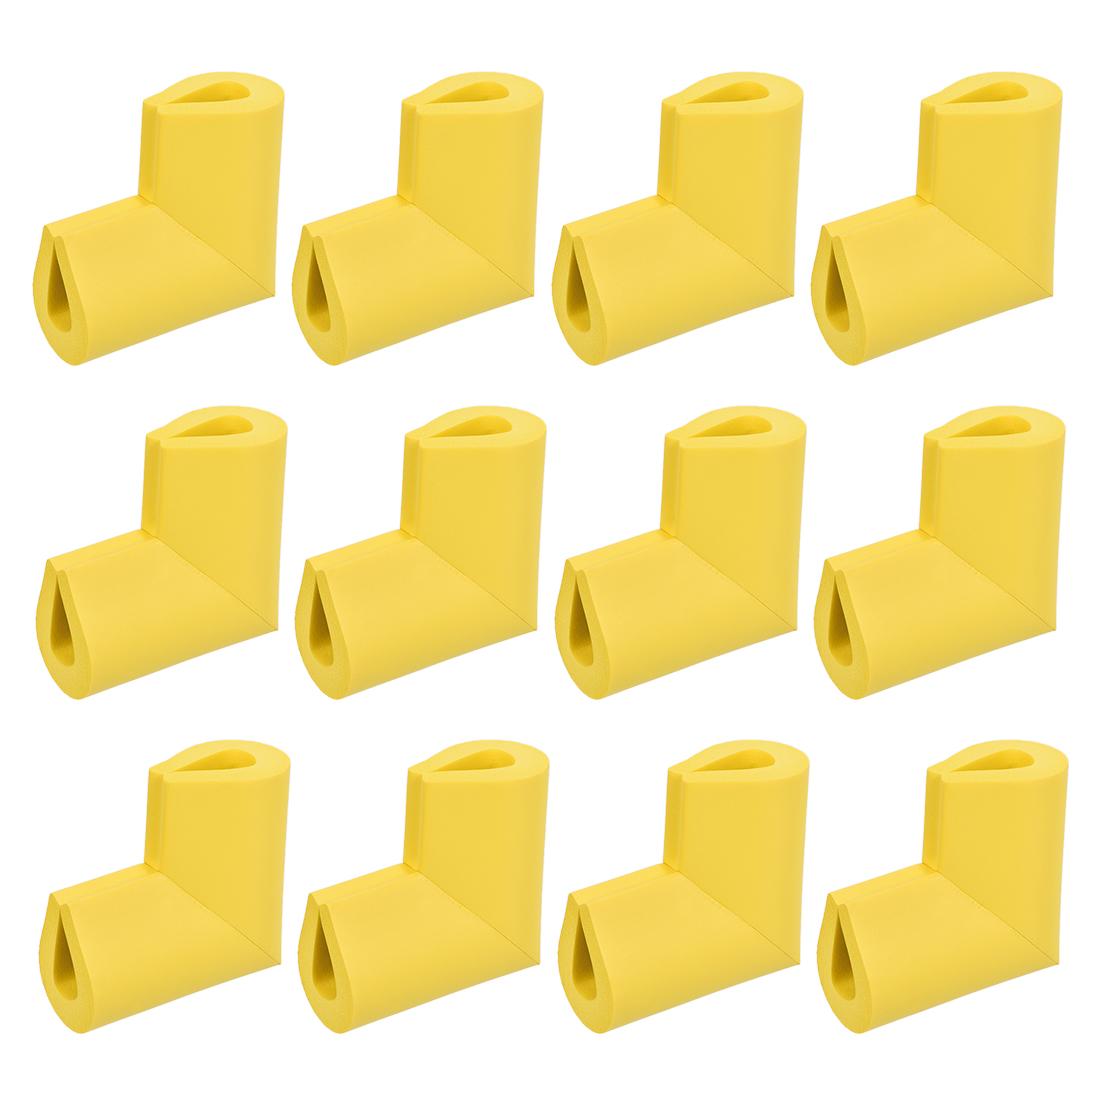 Corners Table Edge Guard U Shaped Angle Corner Guards 55 x 38 x 8mm Yellow 12pcs